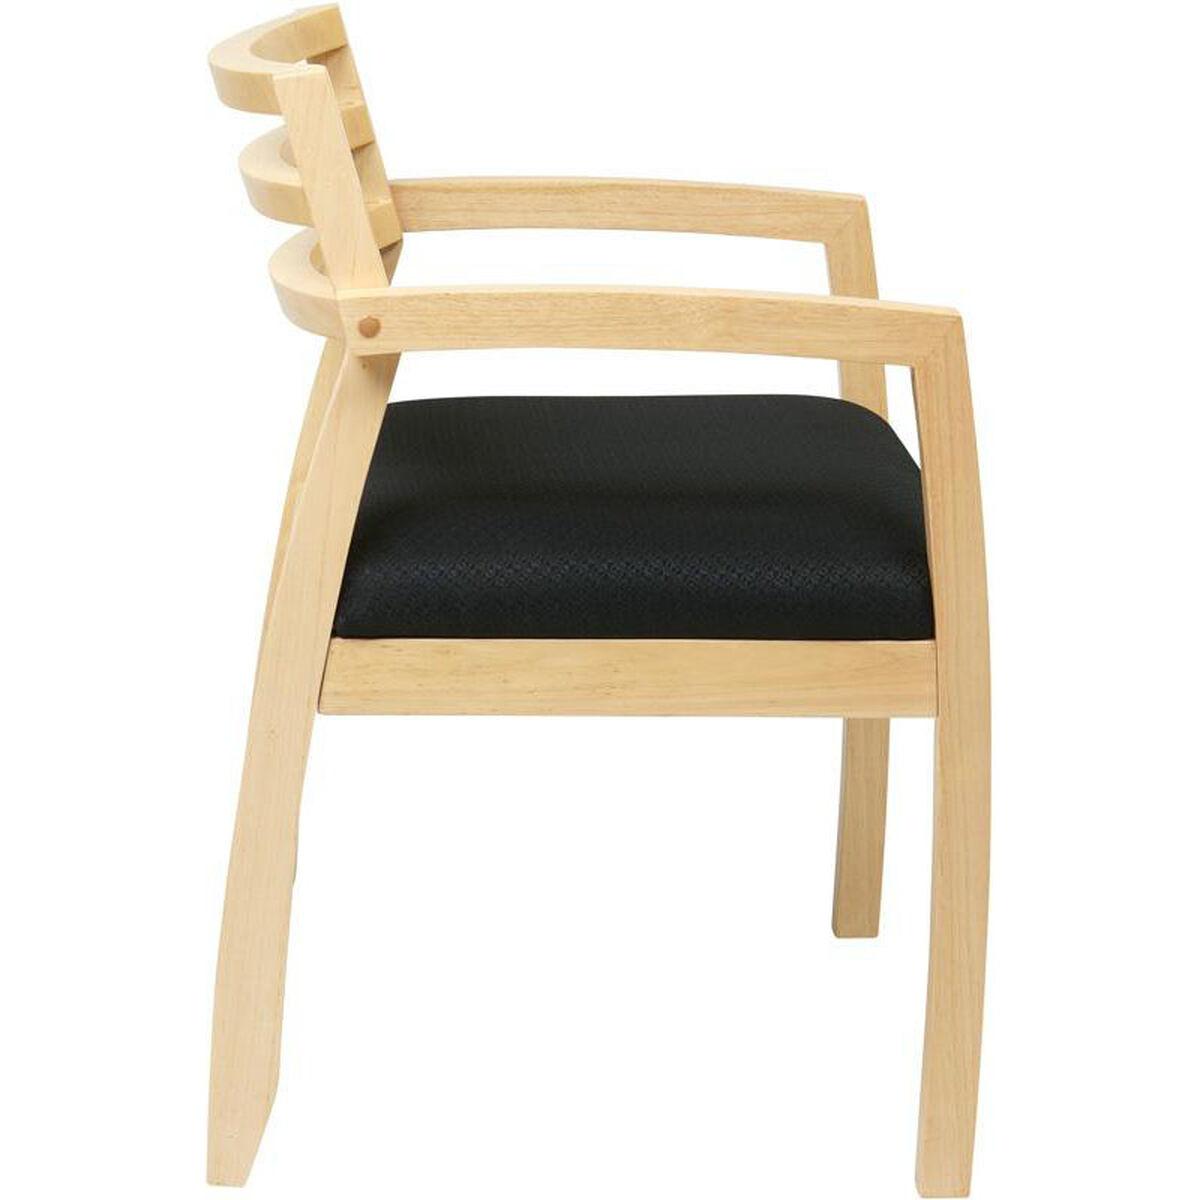 napa maple guest chair nap91mpl 3 restaurantfurniture4less com